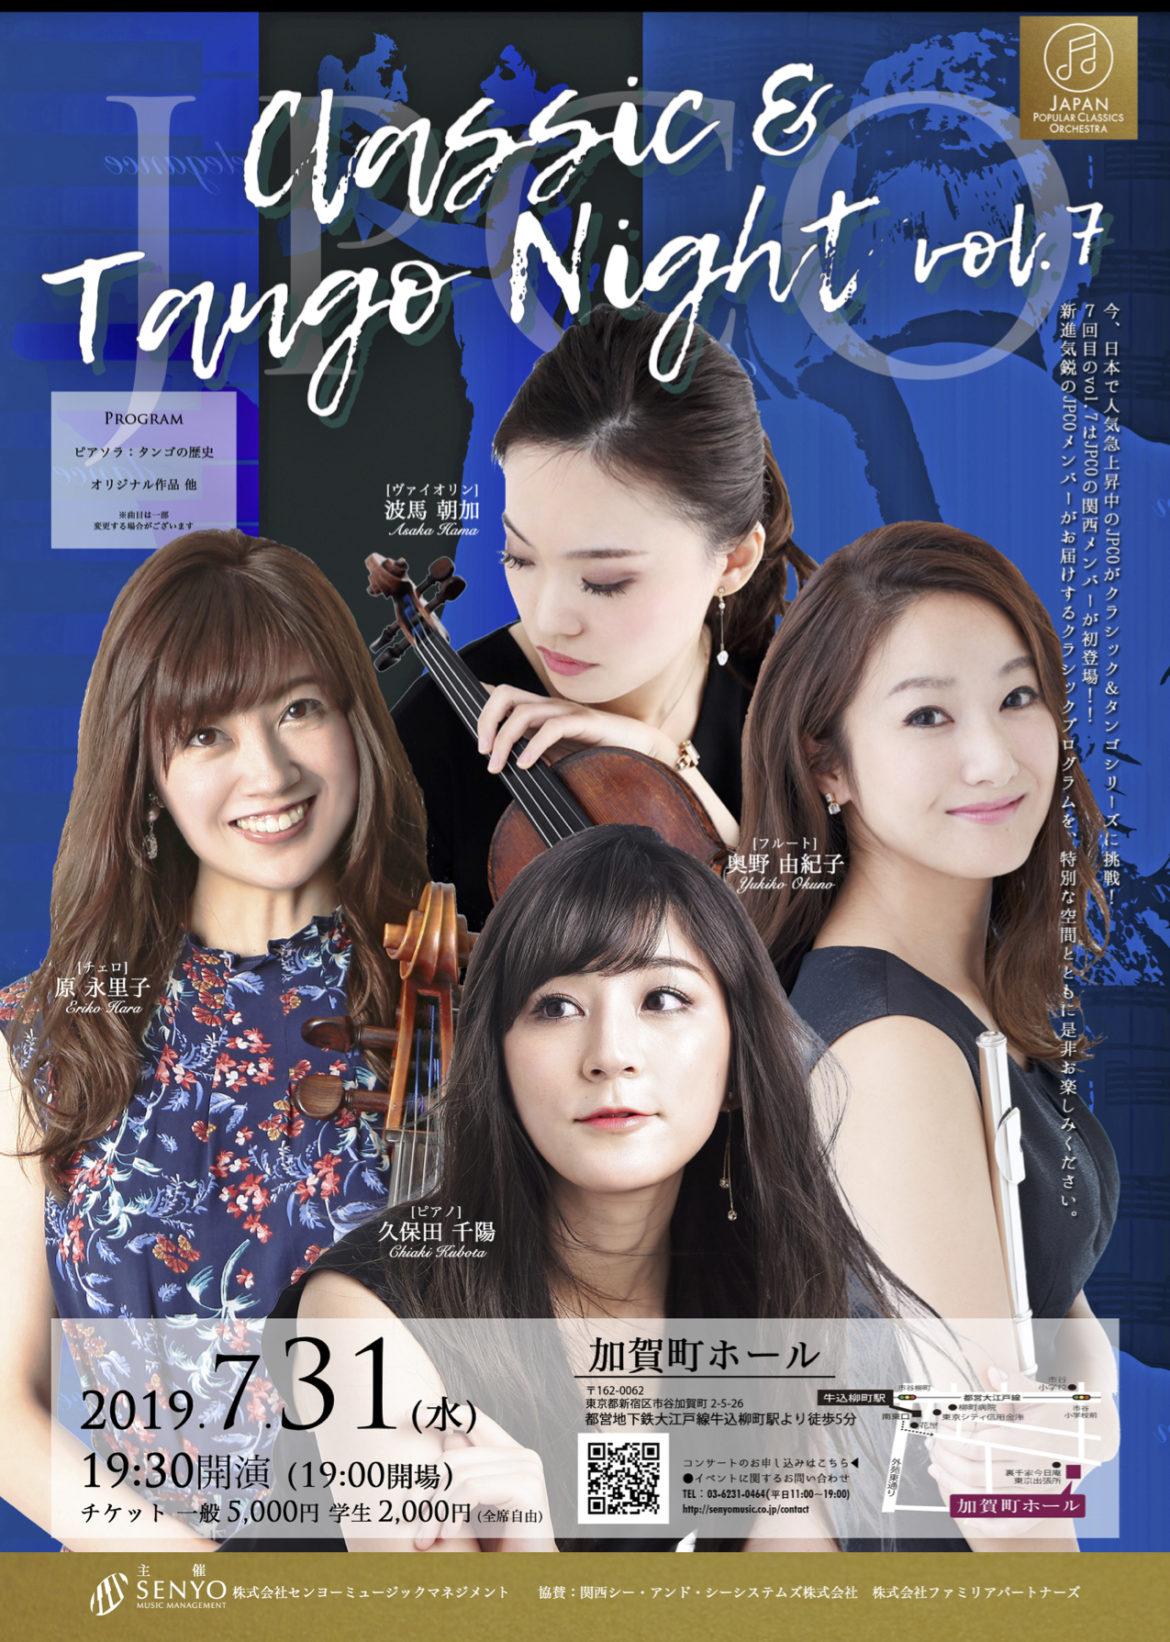 2019.7.31  JPCO CLASSIC & TANGO NIGHT  vol.7